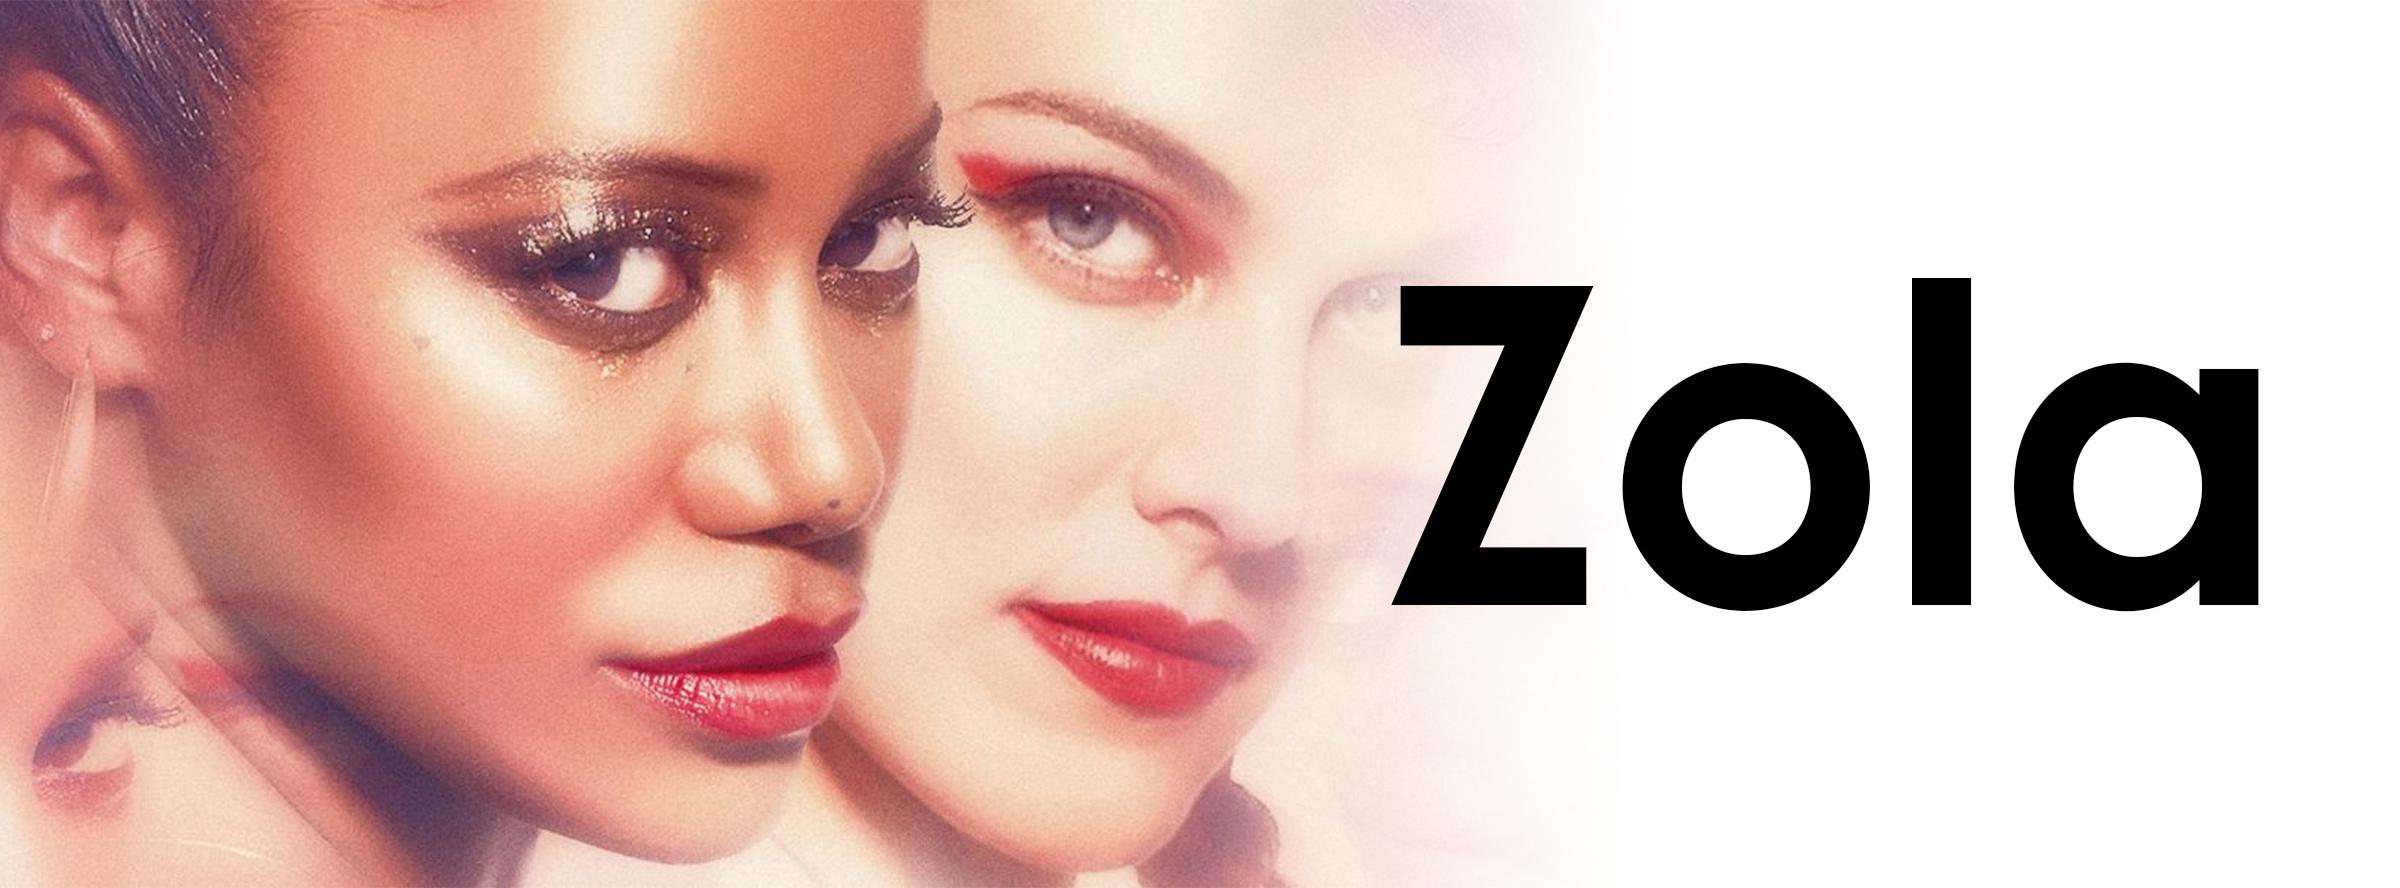 Slider Image for Zola